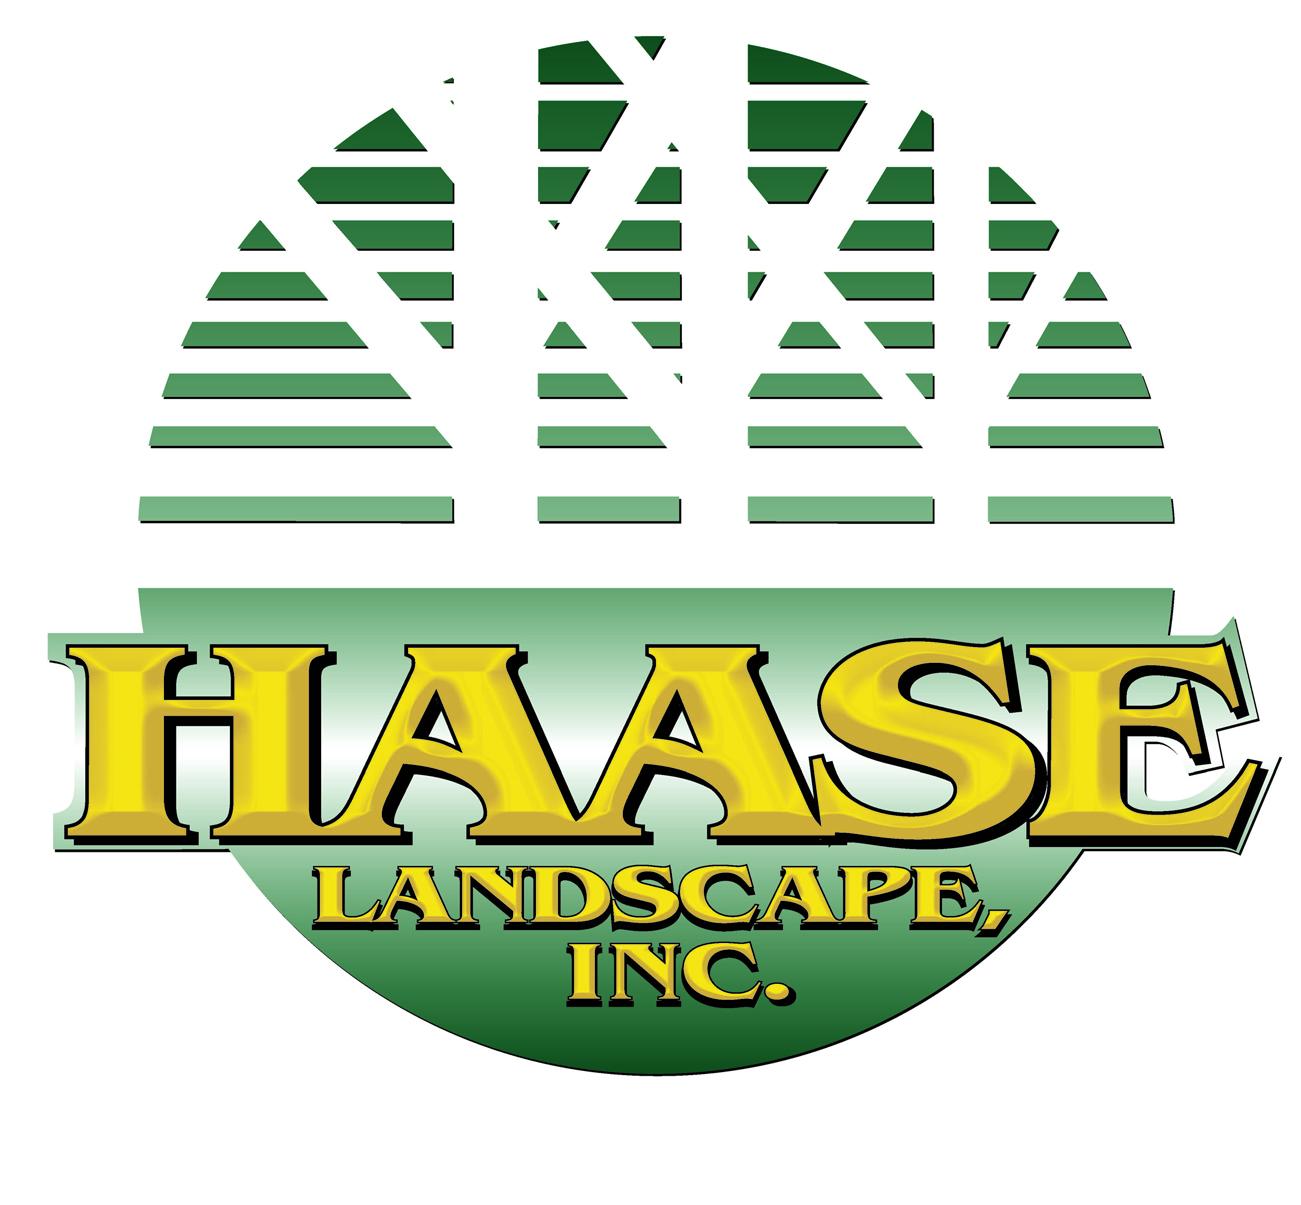 Haase Landscape, Inc.